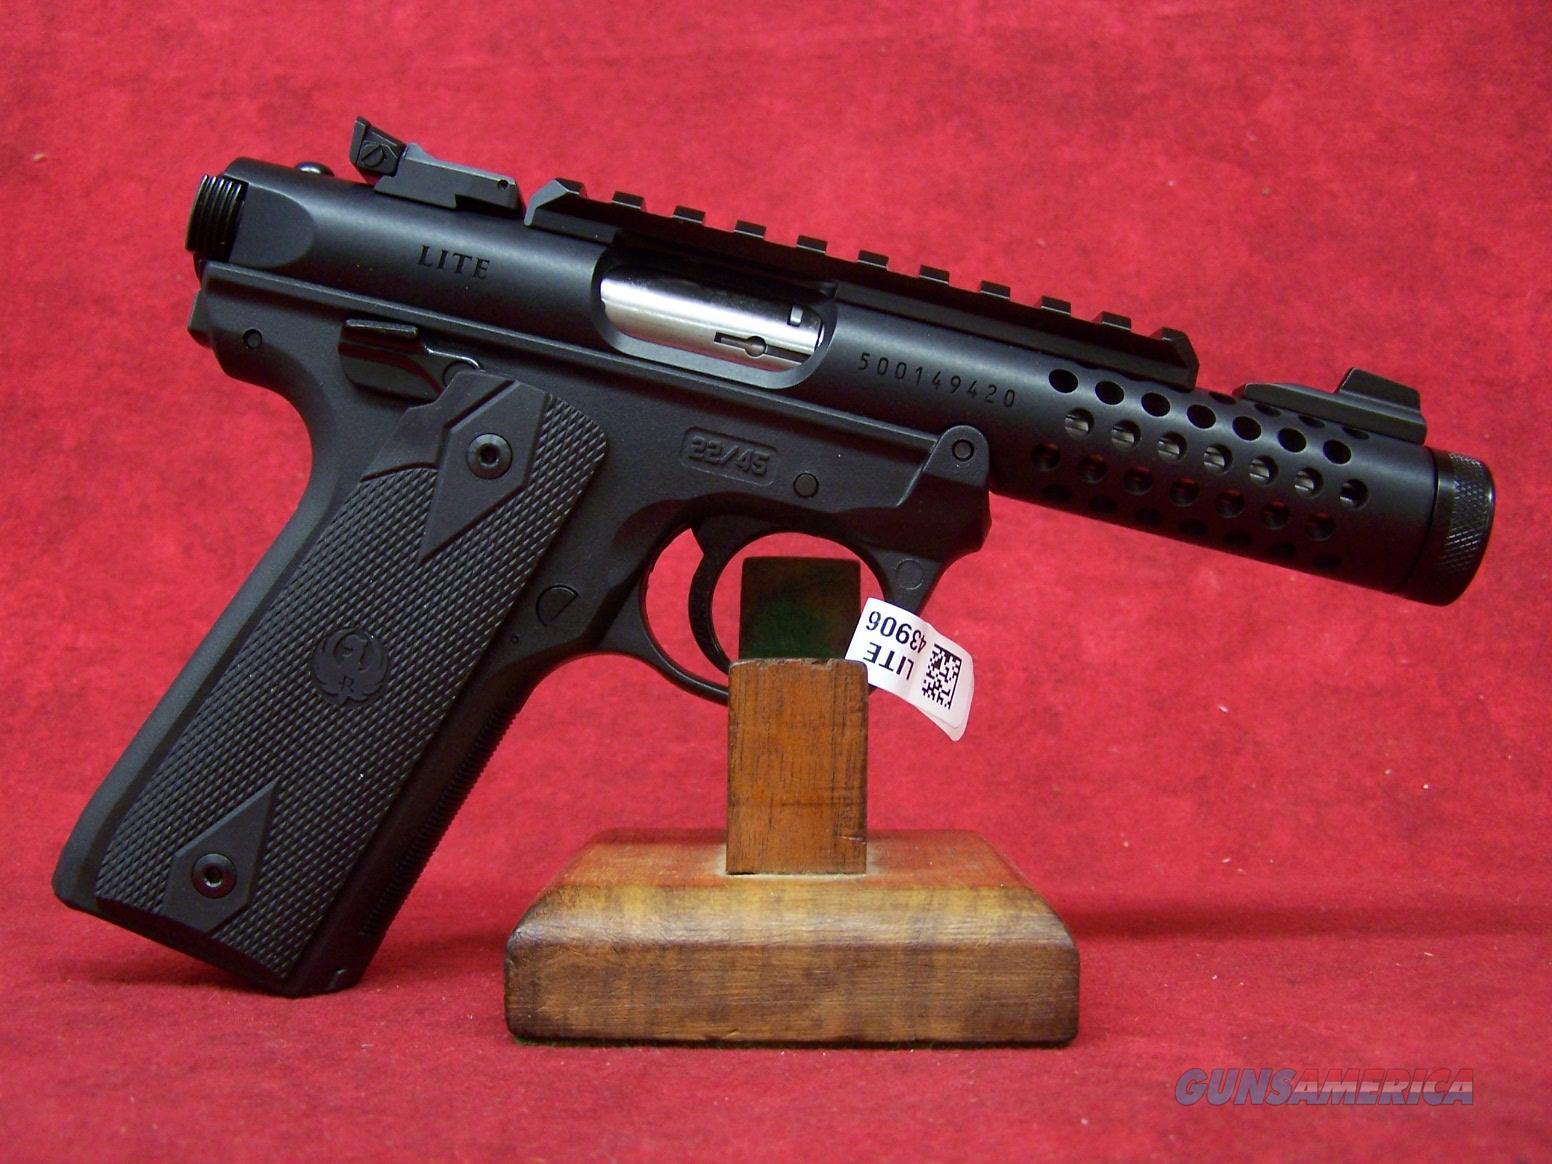 "Ruger Mark IV 22/45 Lite Black Anodized .22LR 4.4"" Barrel (43906)  Guns > Pistols > Ruger Semi-Auto Pistols > Mark I/II/III/IV Family"